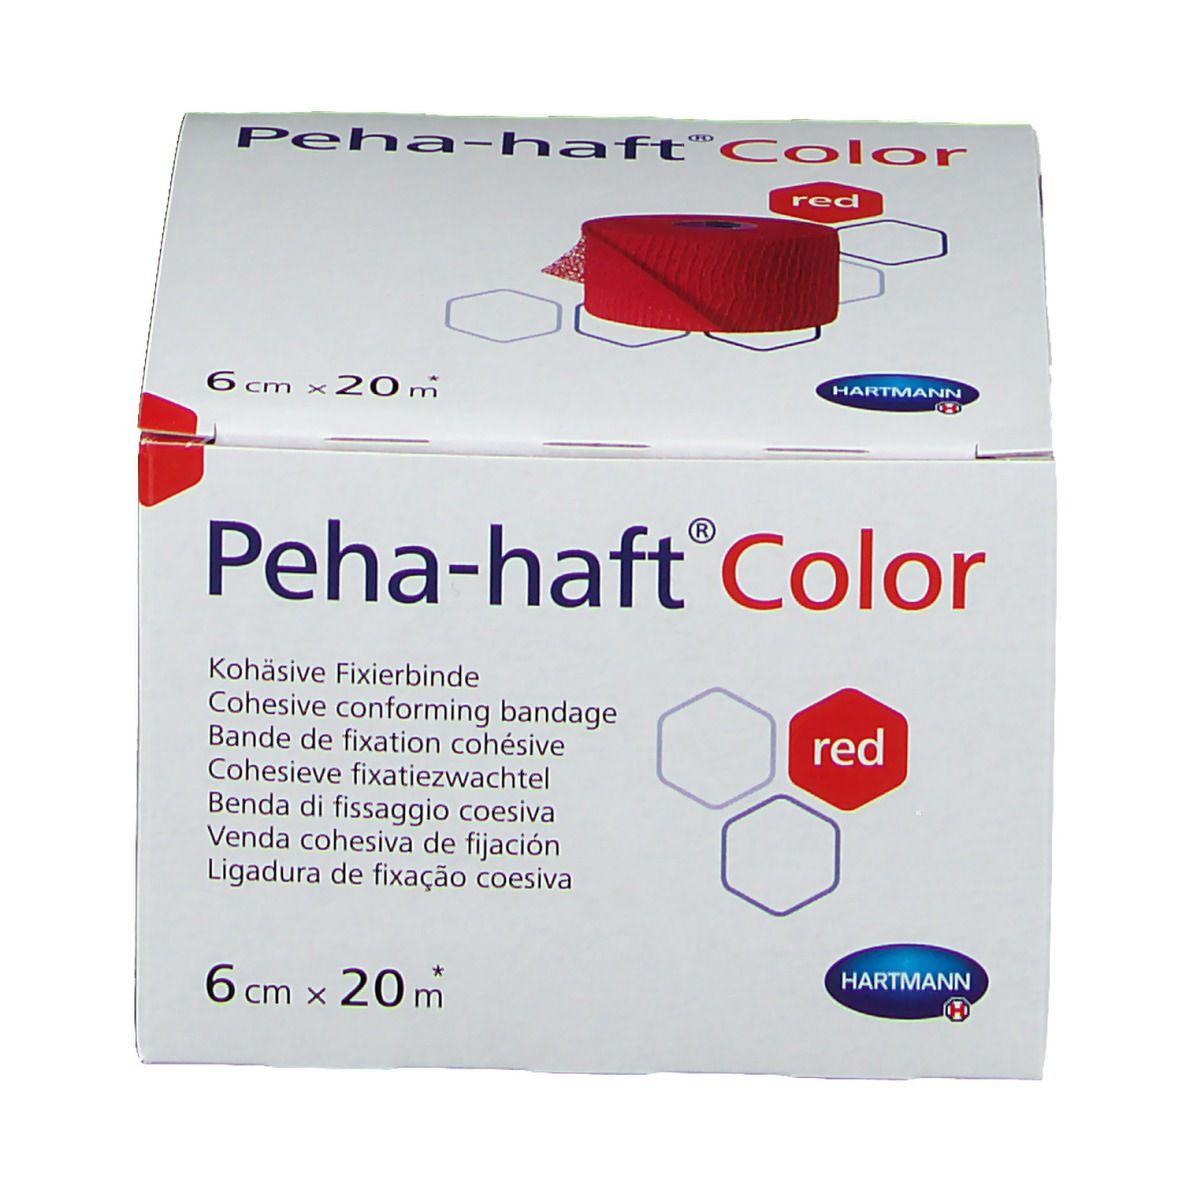 Peha-haft® Color latexfrei 6 cm x 20 m